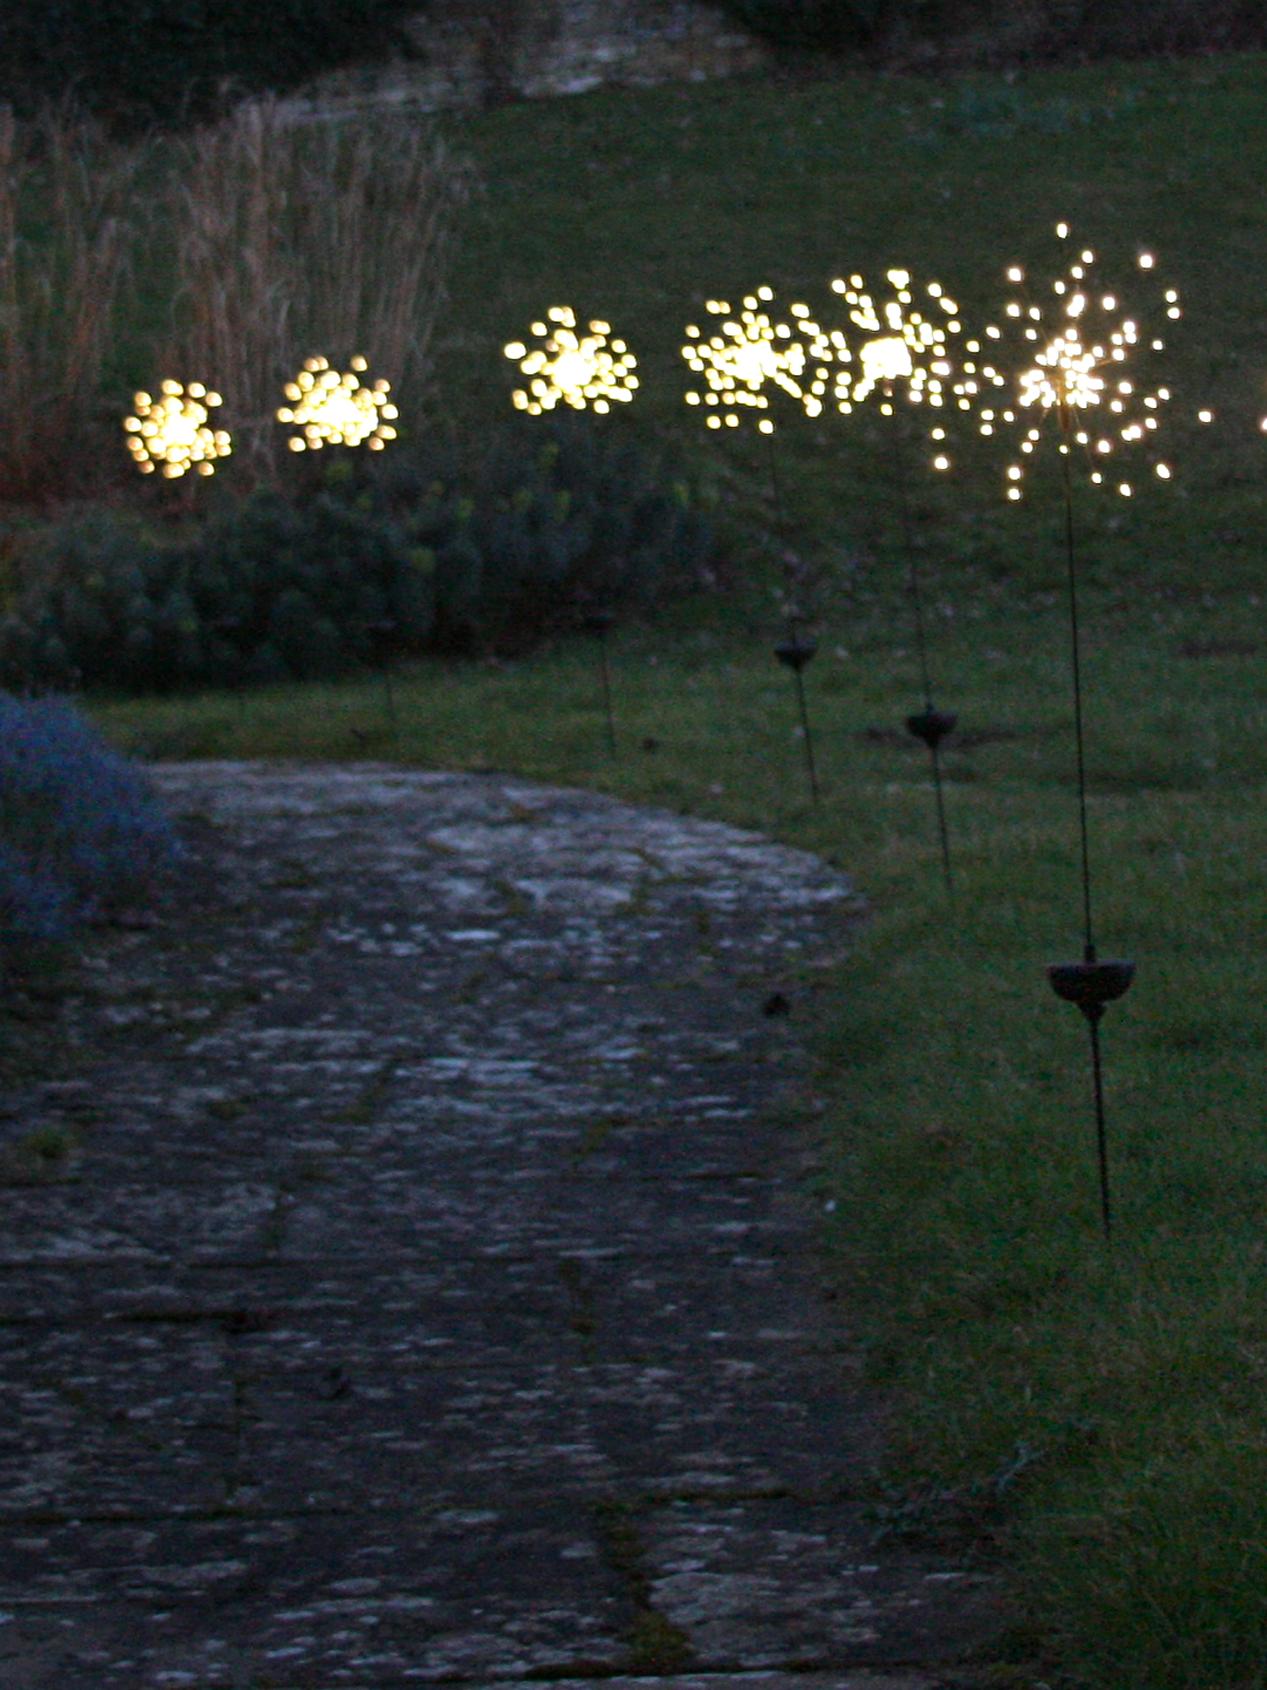 30 Diy Lighting Ideas At Night Yard Landscape With Outdoor Lights Gowritter Solar Lights Garden Garden Shed Lighting Ideas Garden Night Lighting